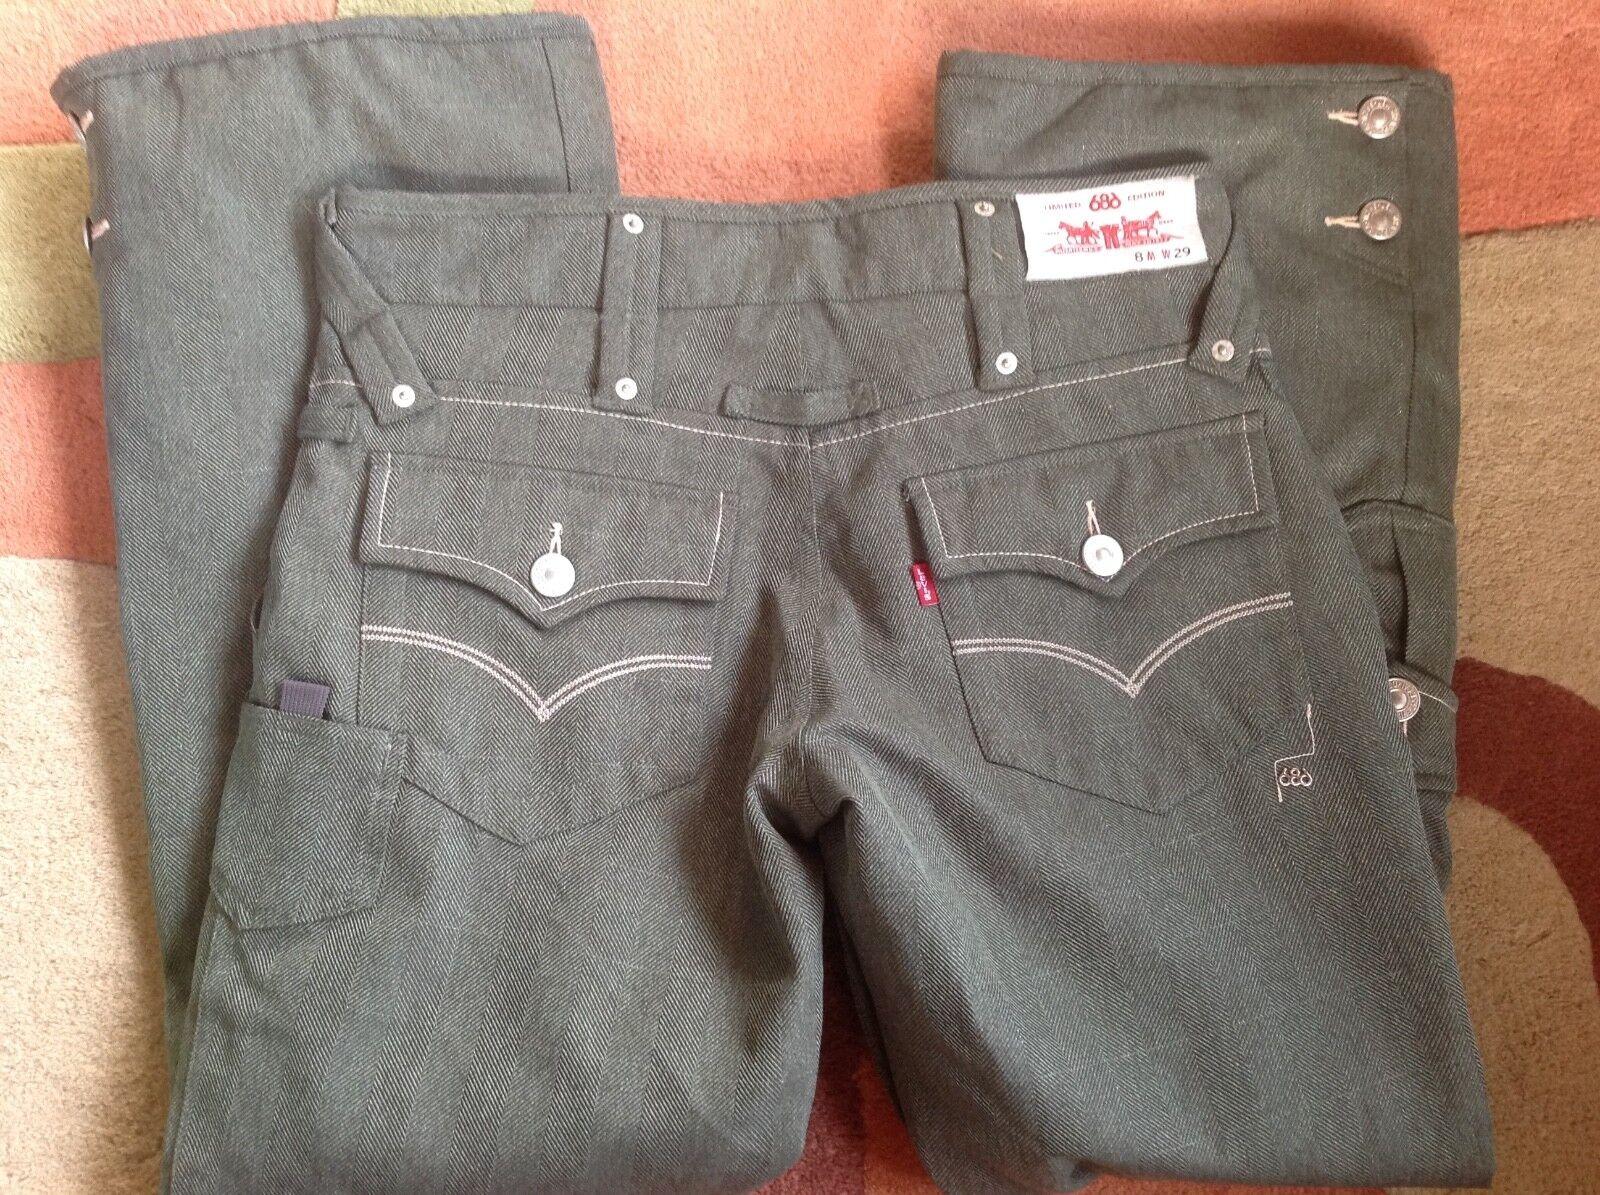 686 Snowboard or ski insulated pants. Women's small. Denim jeans. Goretex